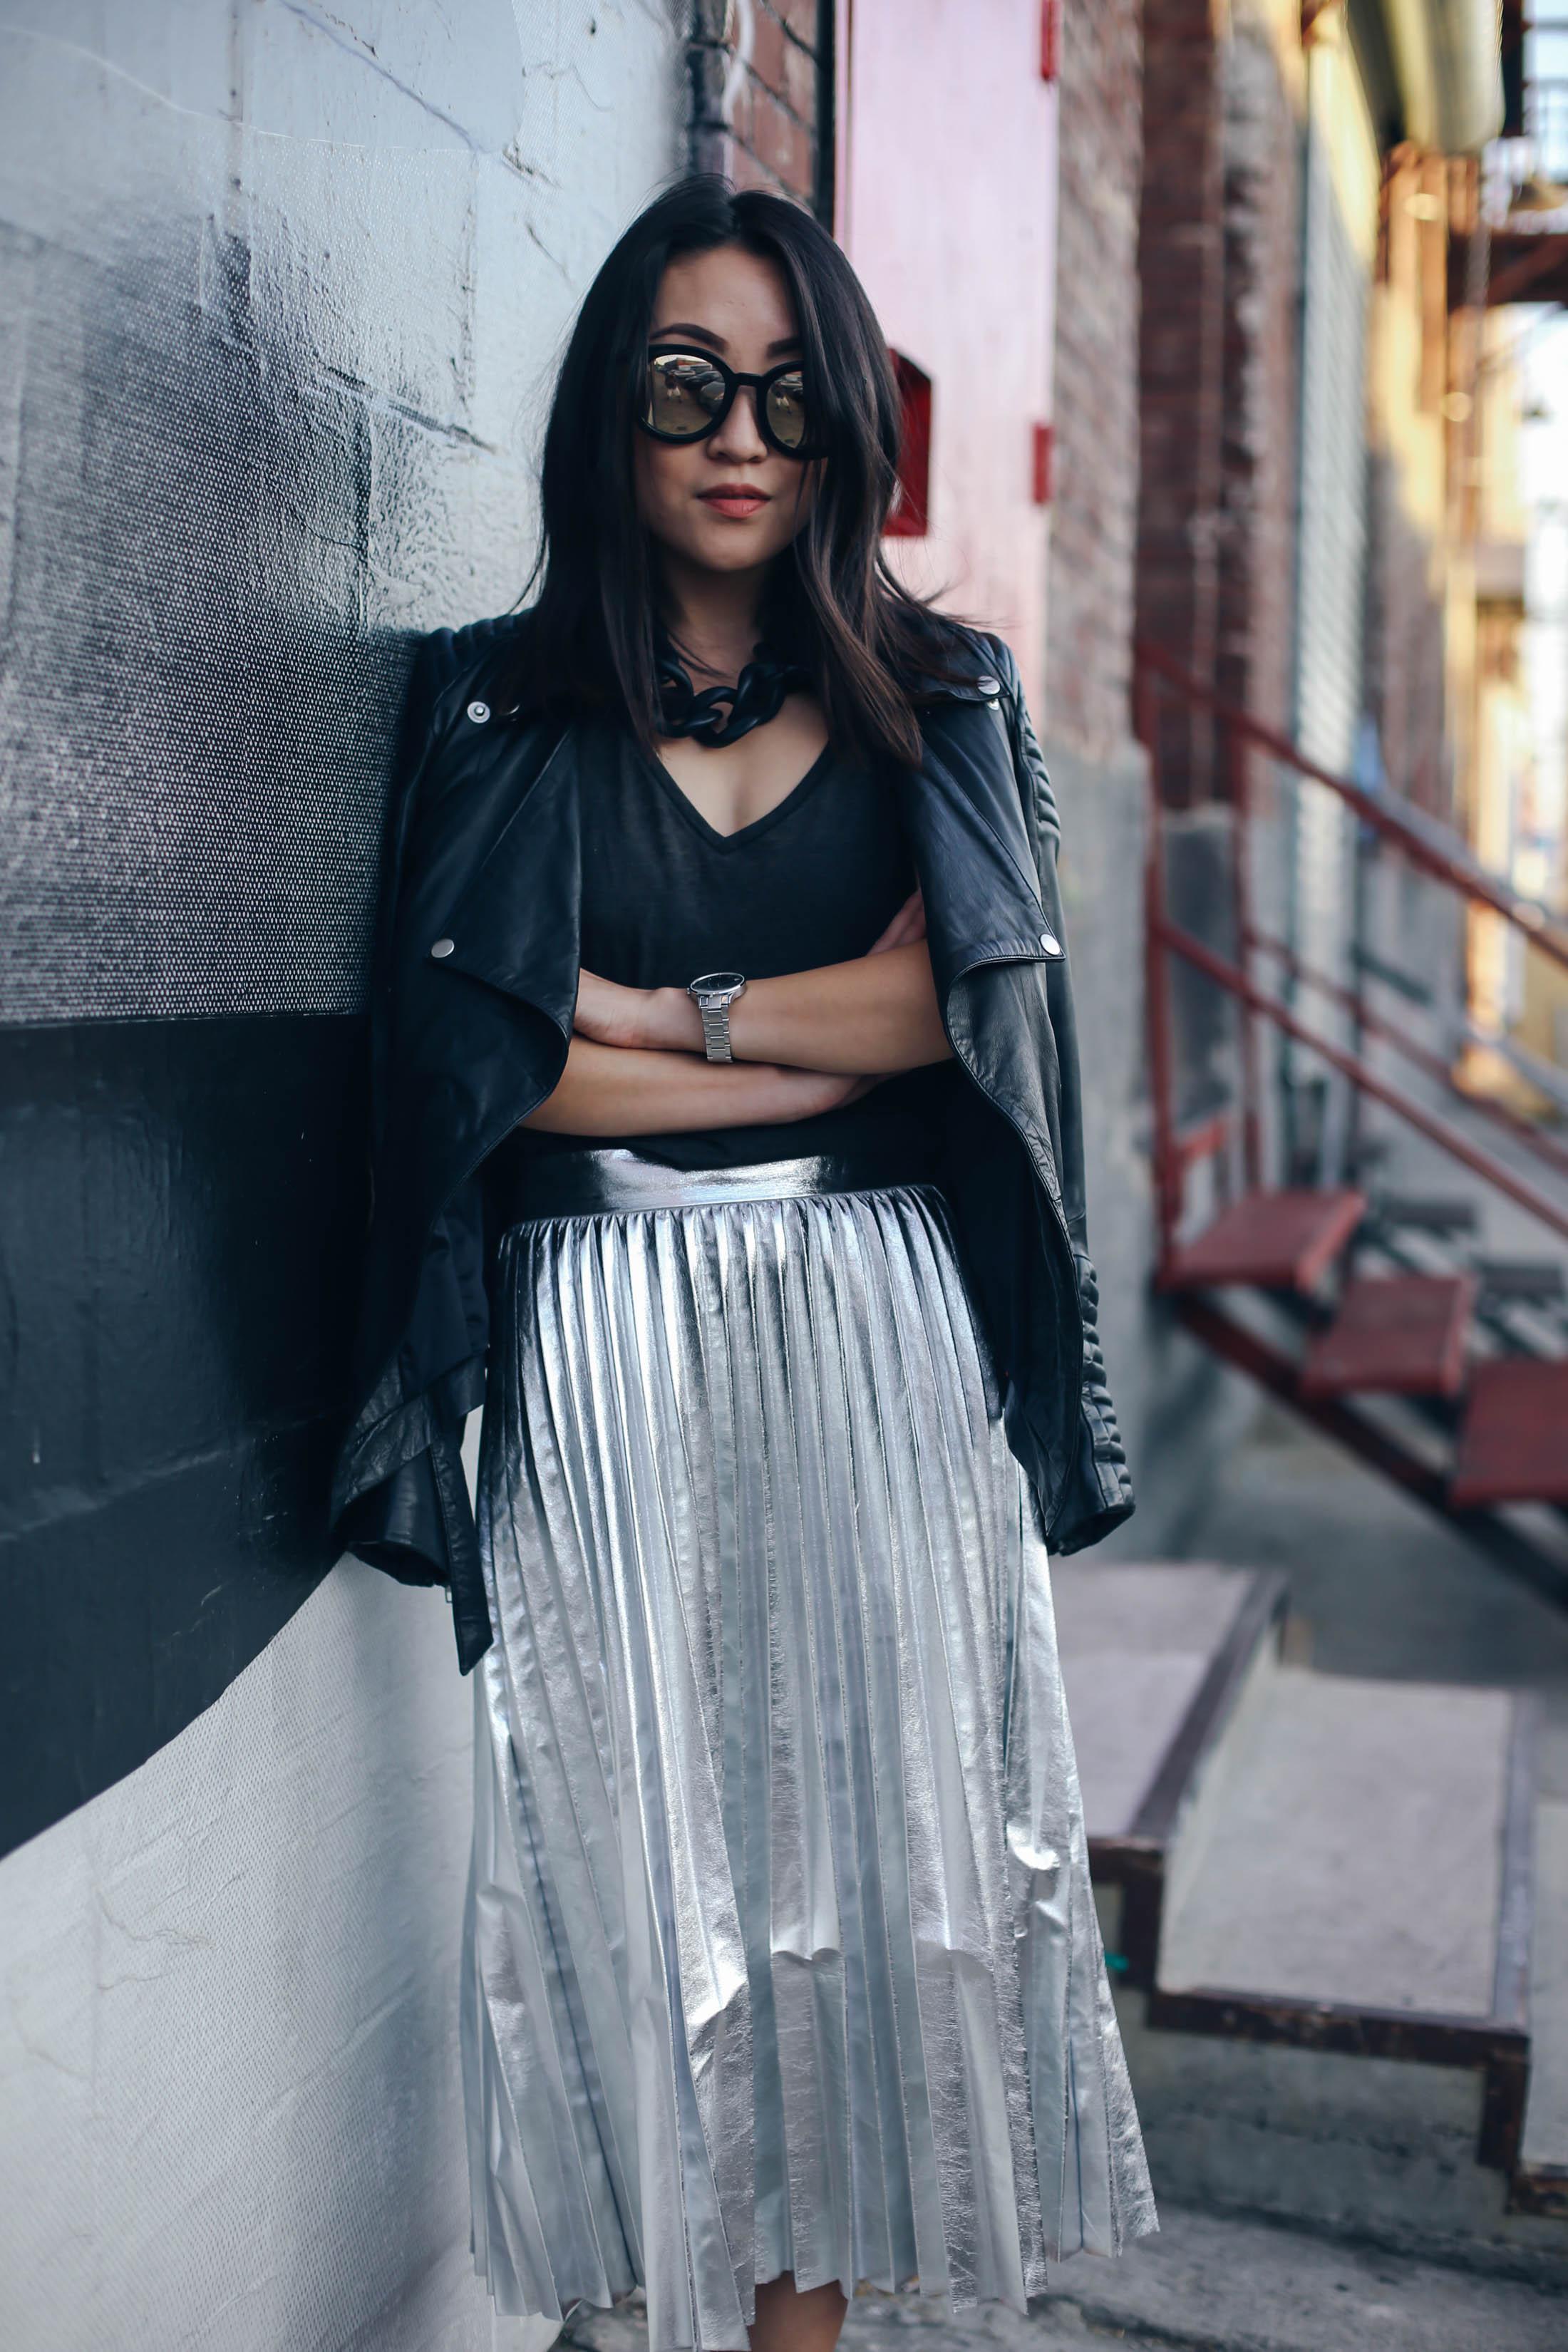 2-silver-skirt-nina-citizensrunway-ryanbyryanchua-9355.jpg